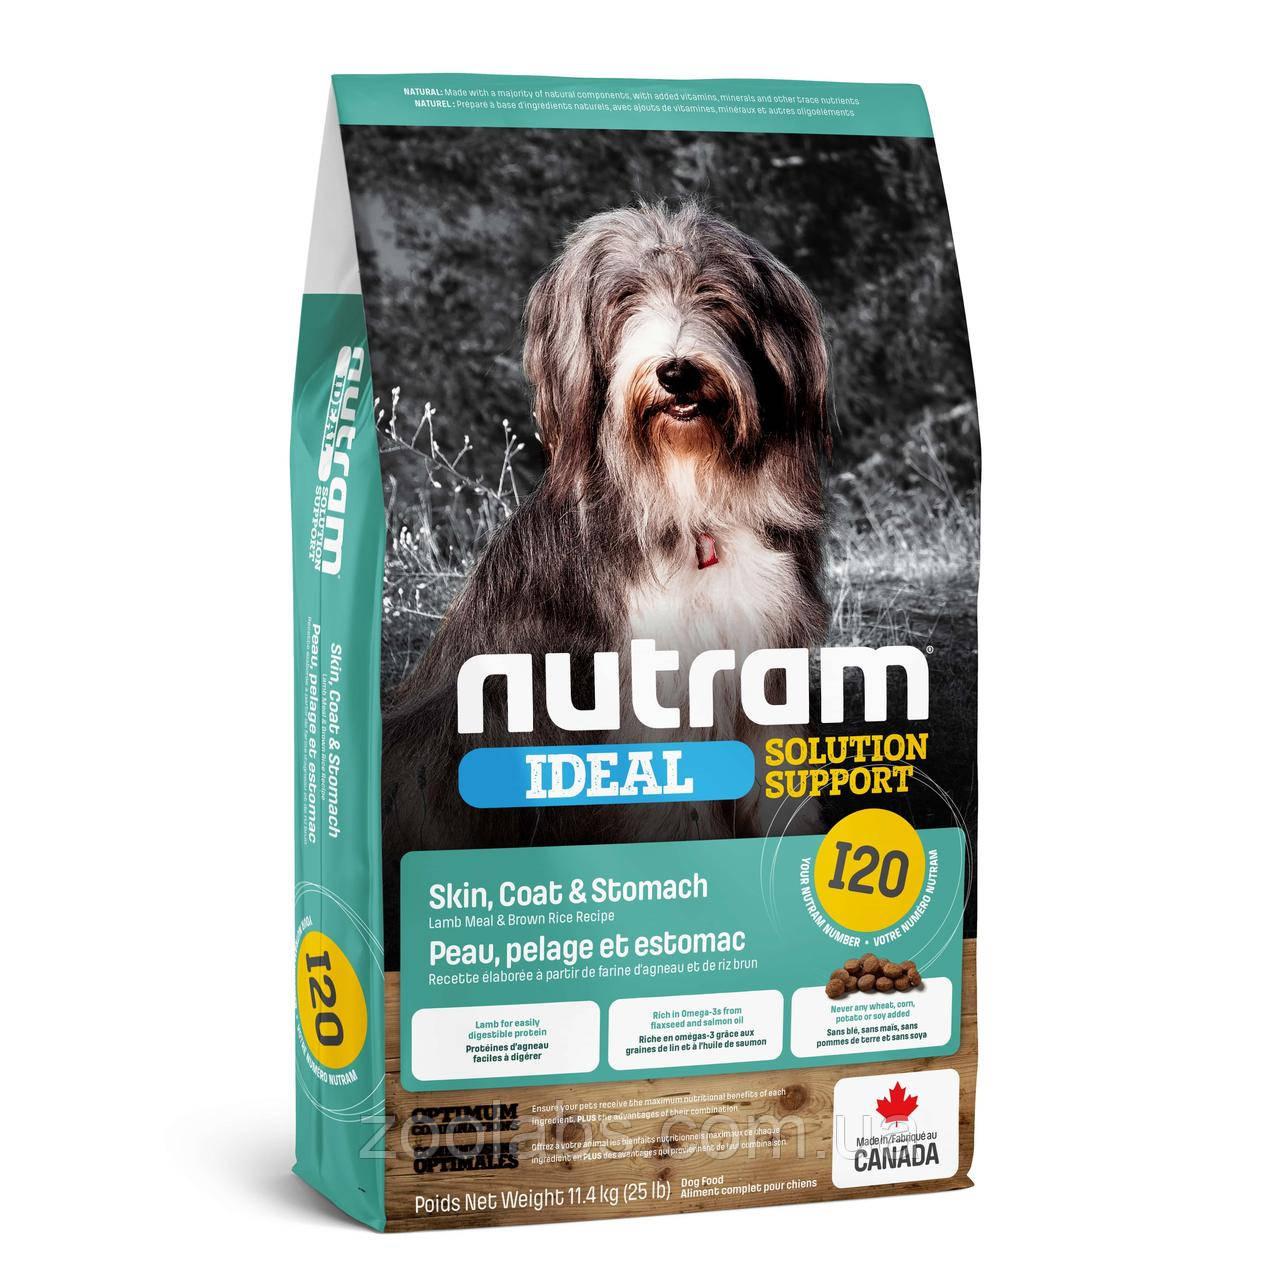 Корм Nutram для собак   Nutram I20 Ideal Solution Support Sensitive Skin, Coat & Stomach Dog 20 кг